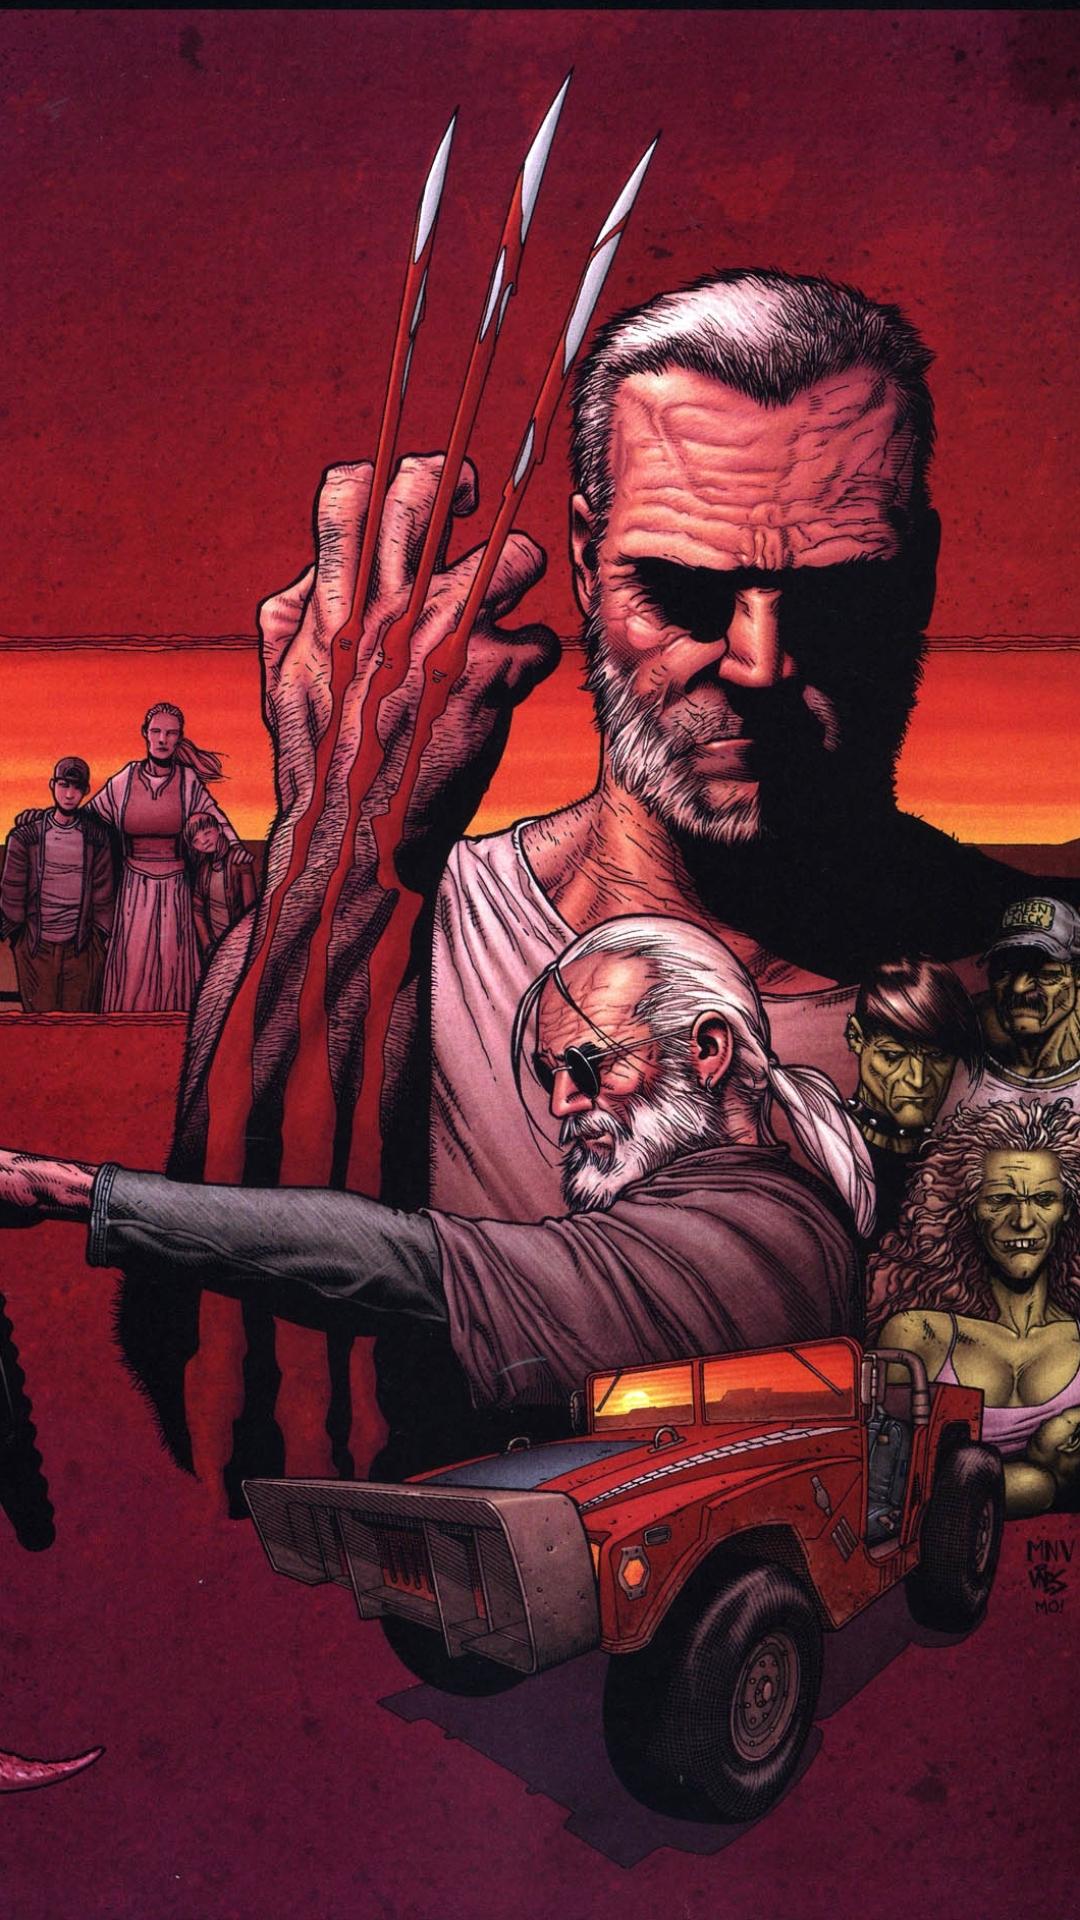 comics/old man logan (1080x1920) wallpaper id: 668851 - mobile abyss